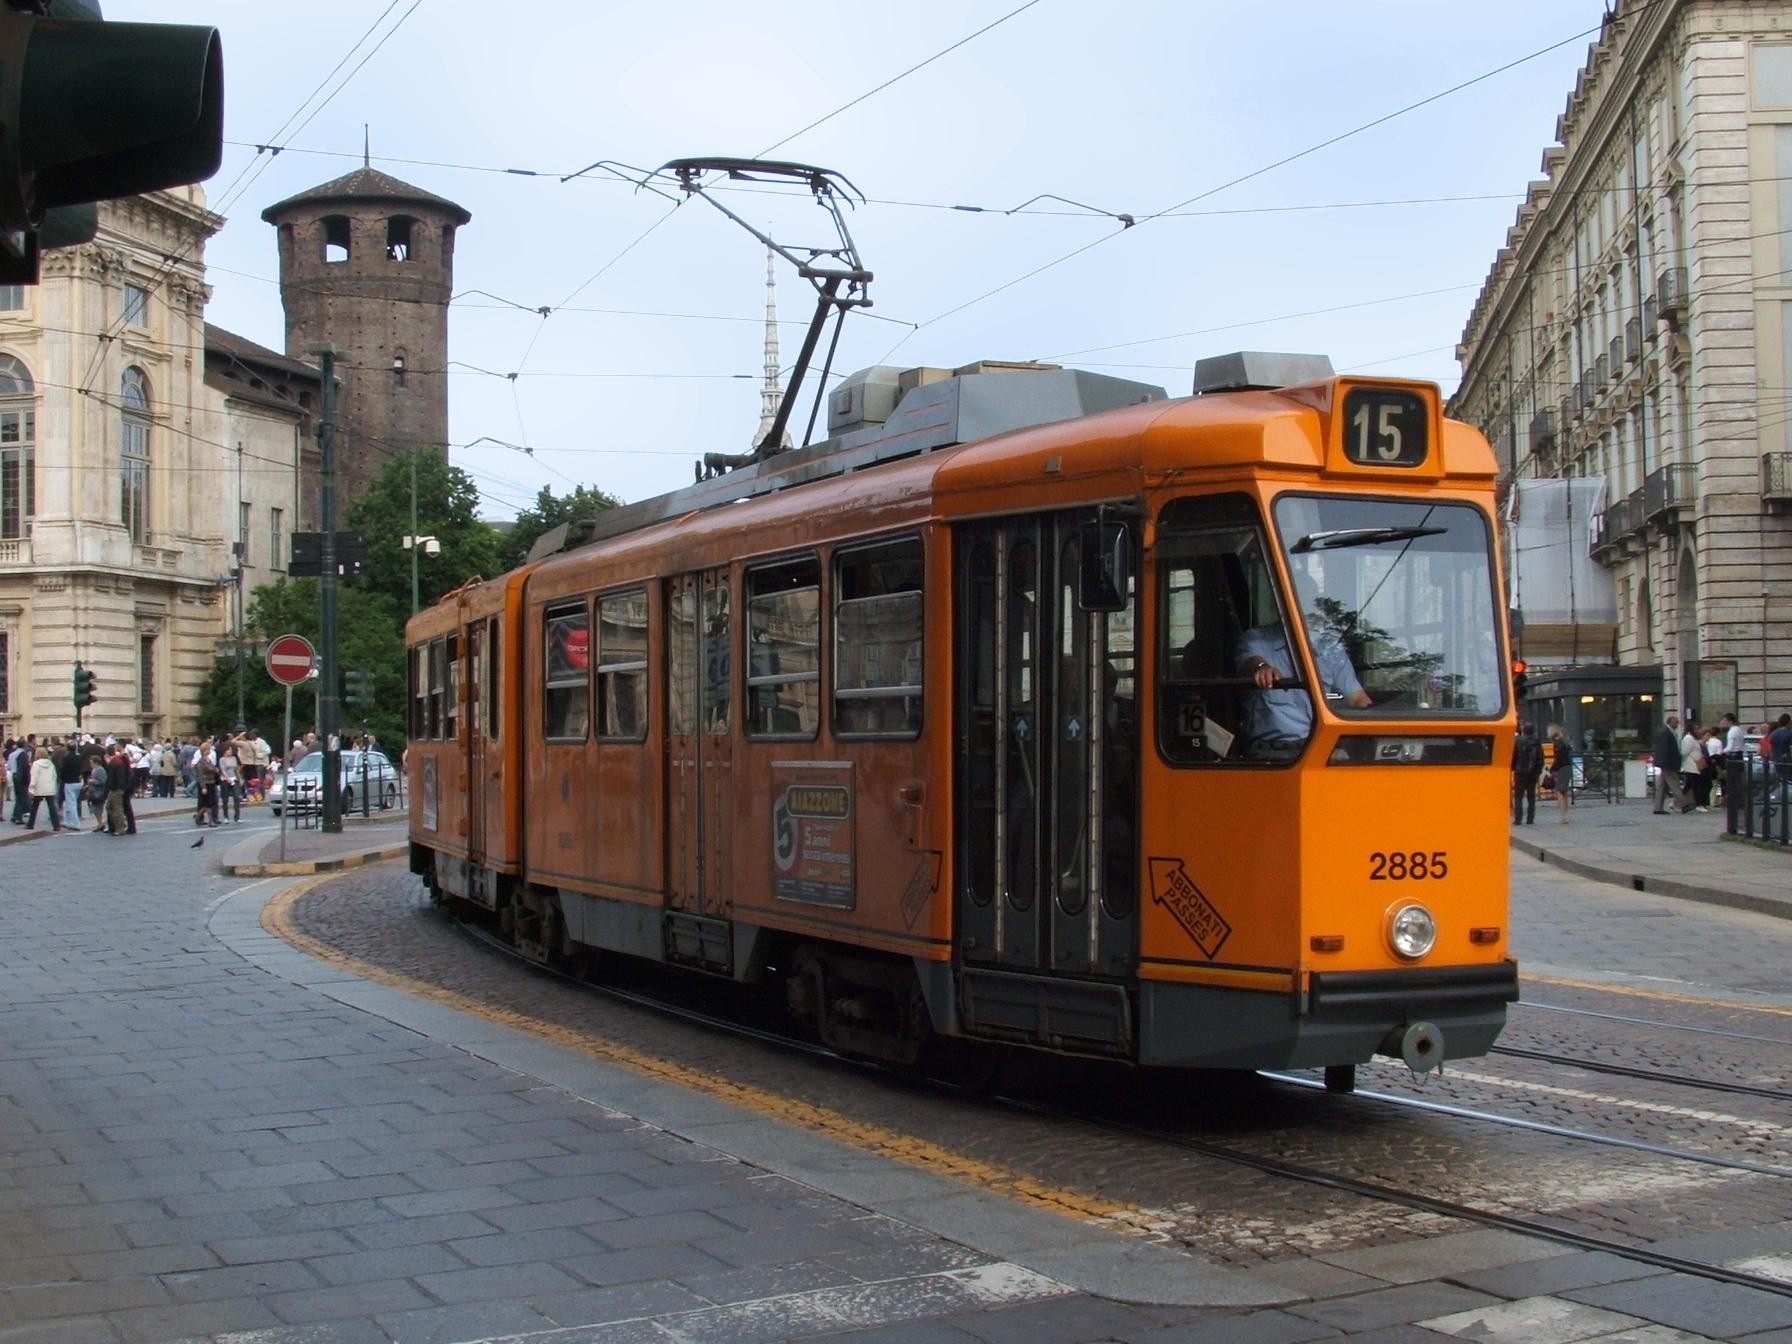 Tram photo